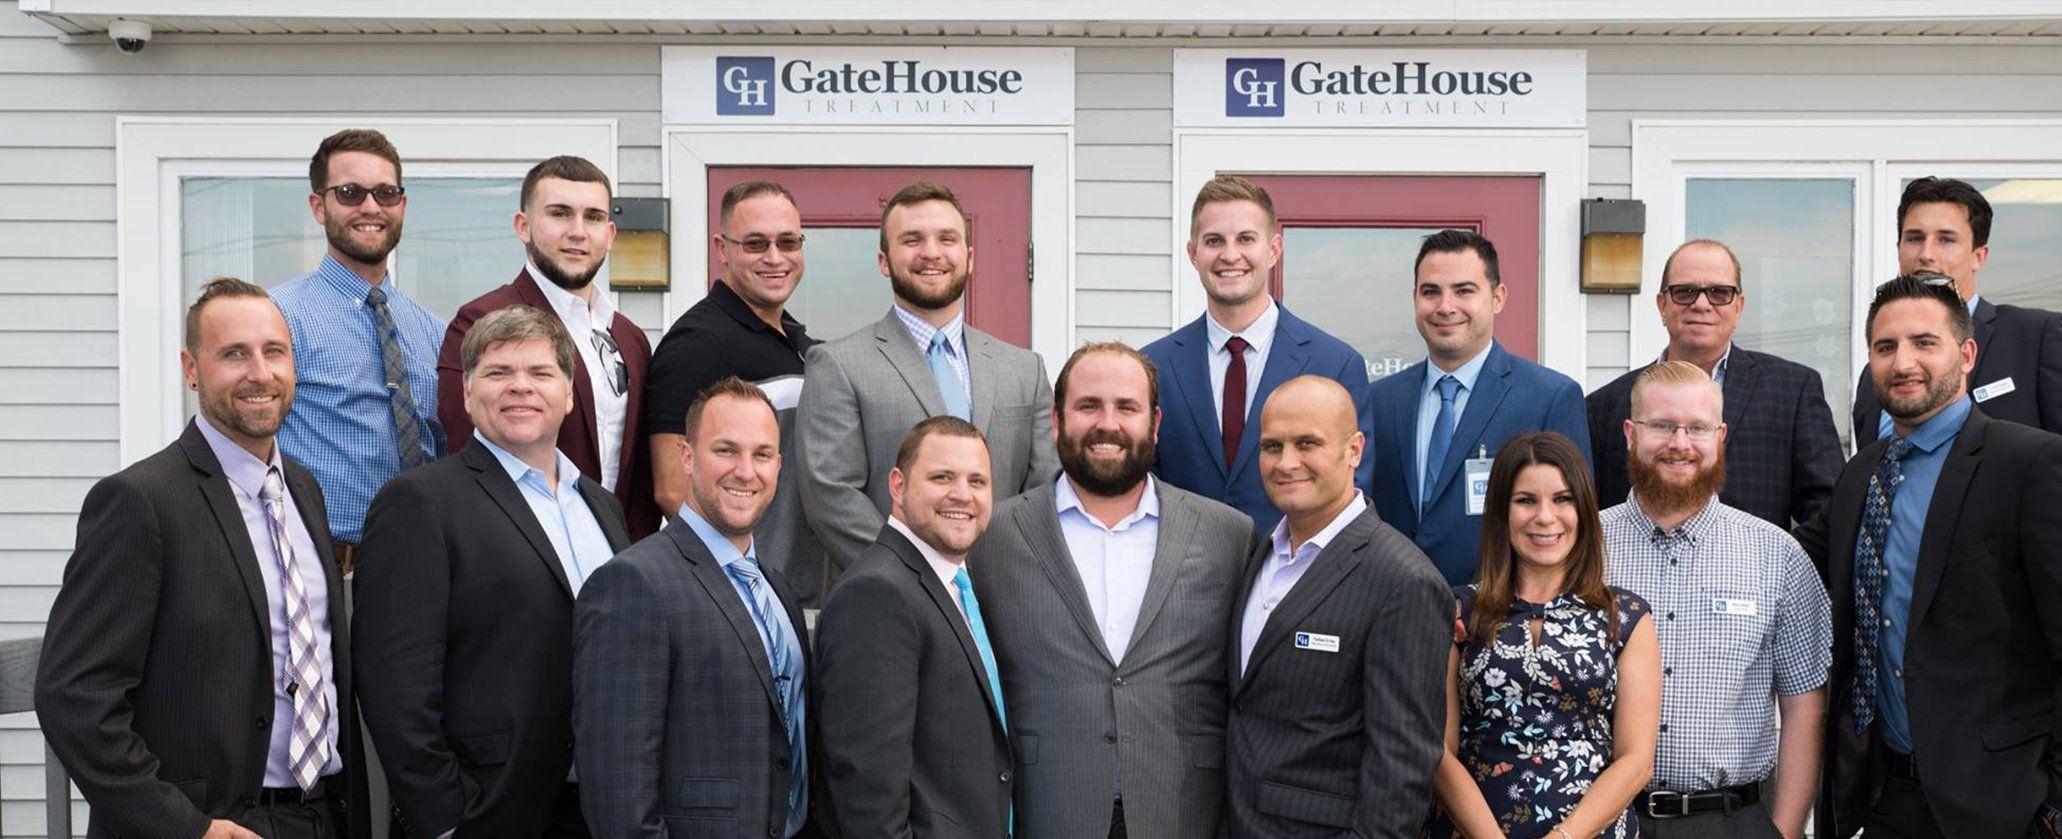 GateHouse Treatment Team photo